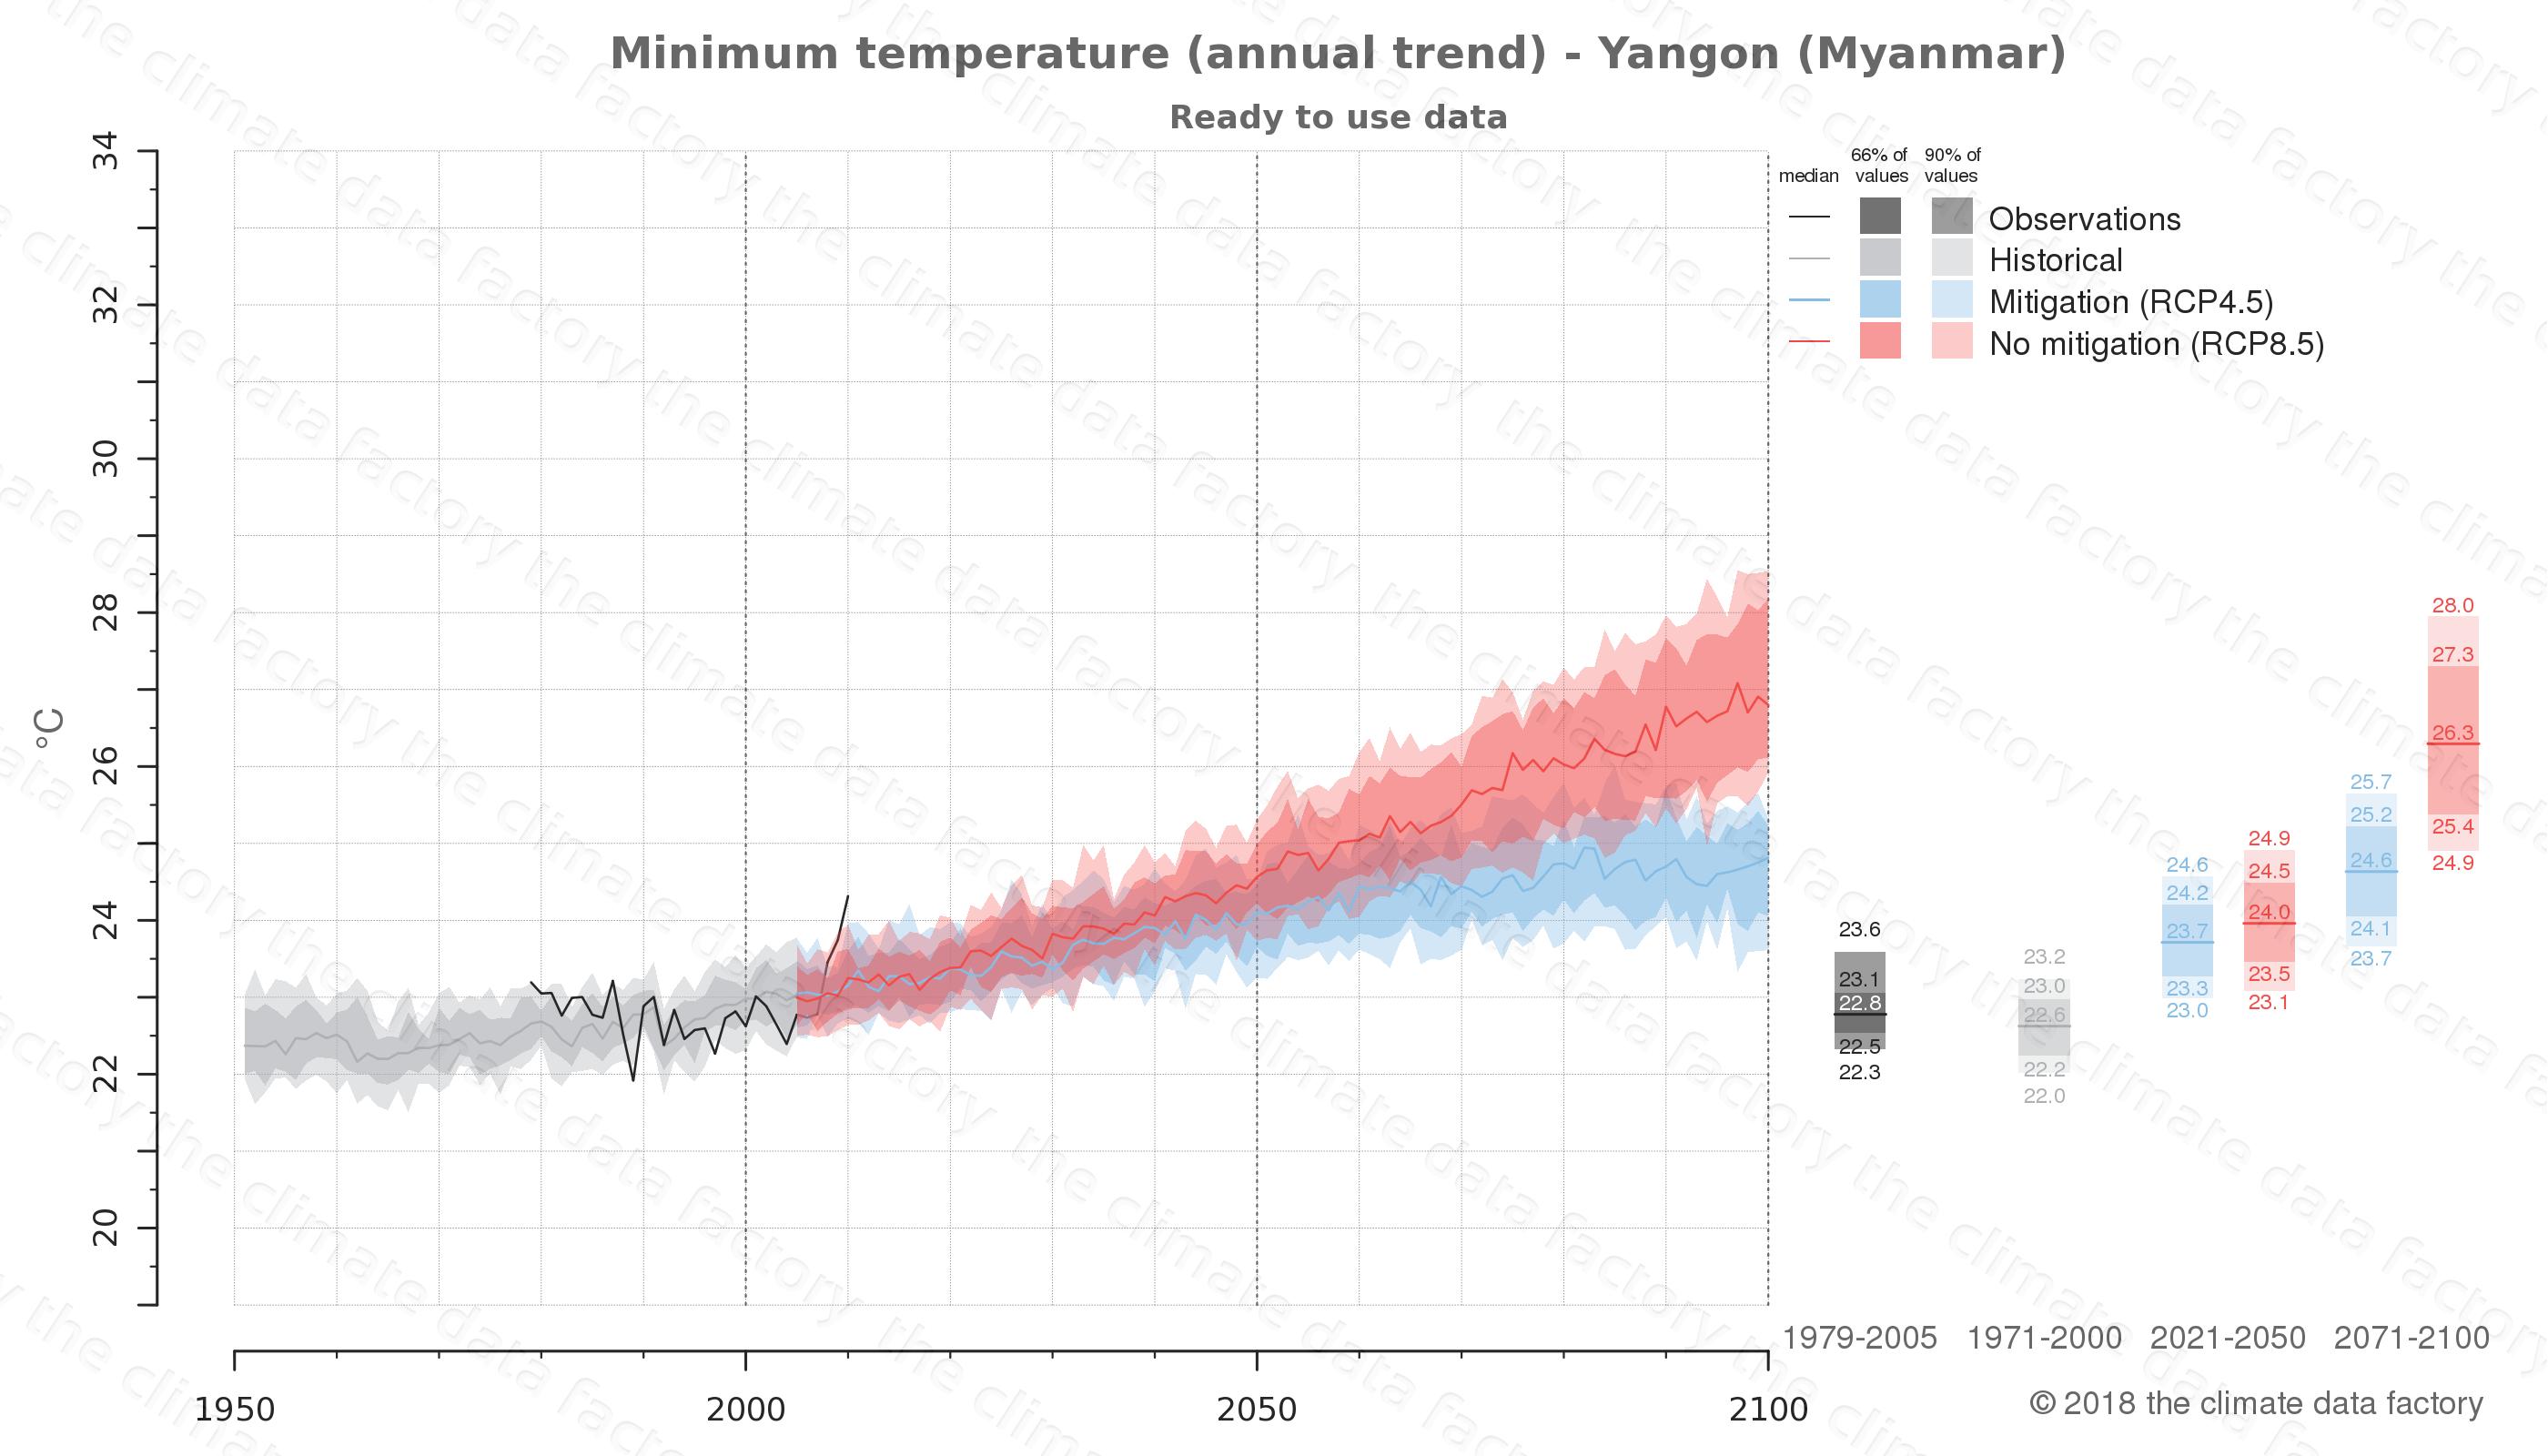 climate change data policy adaptation climate graph city data minimum-temperature yangon myanmar